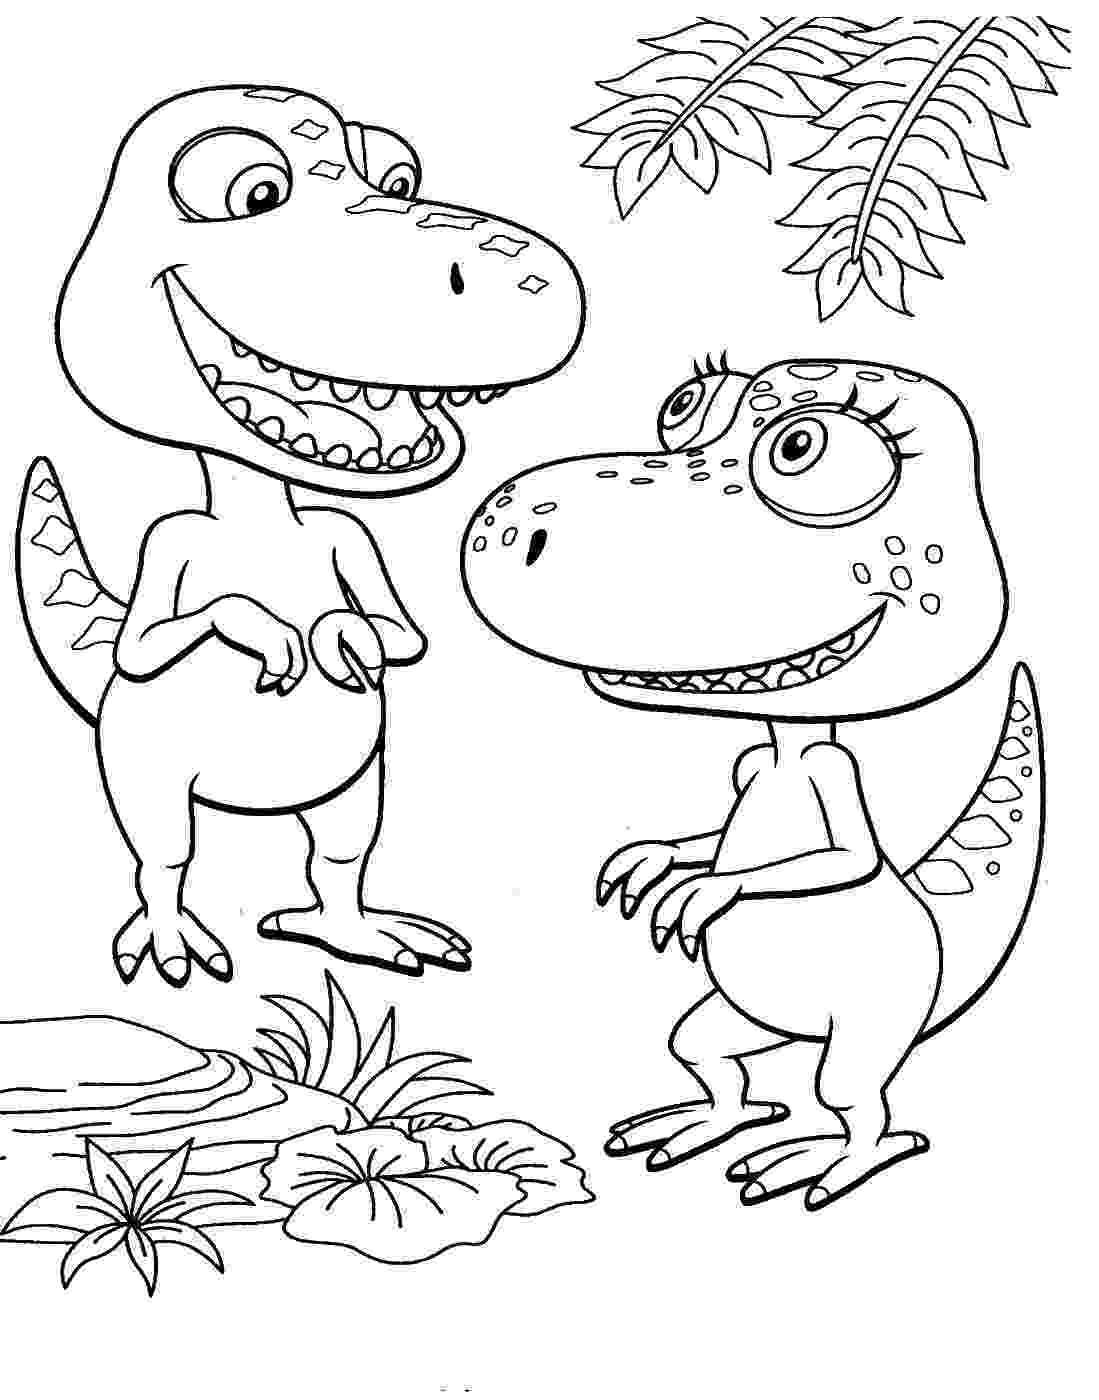 dinosaur sheets free printable dinosaur coloring pages for kids sheets dinosaur